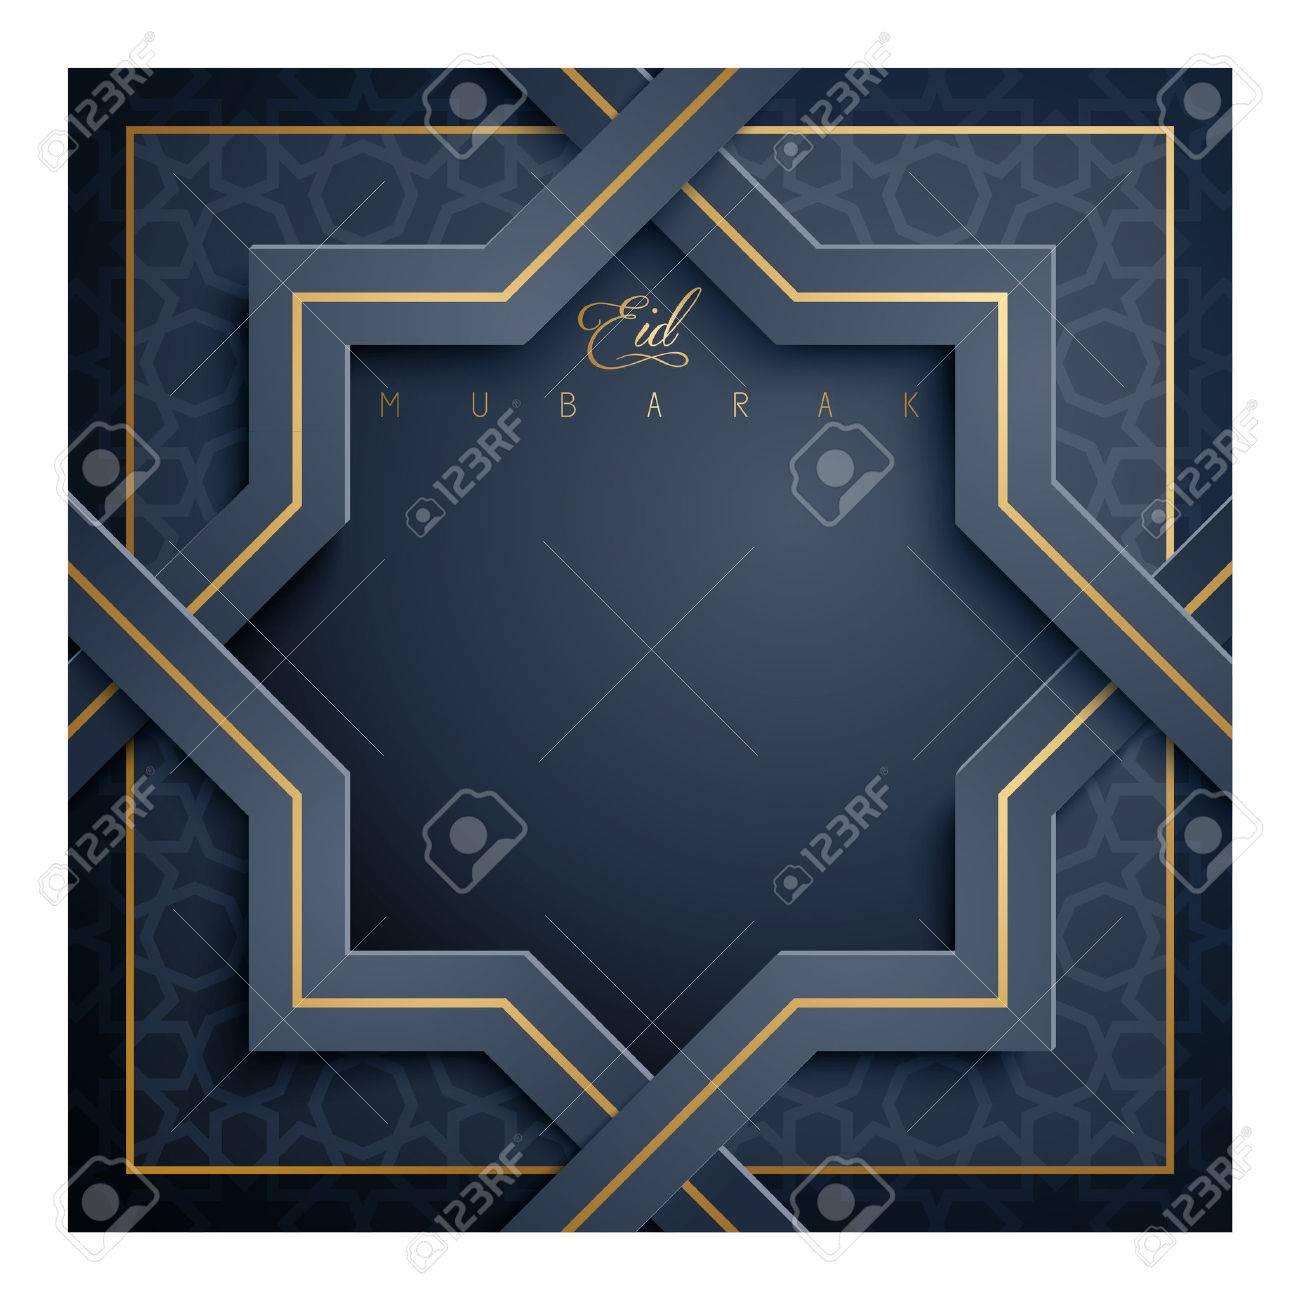 Eid Mubarak greeting card template islamic banner background - 62182750